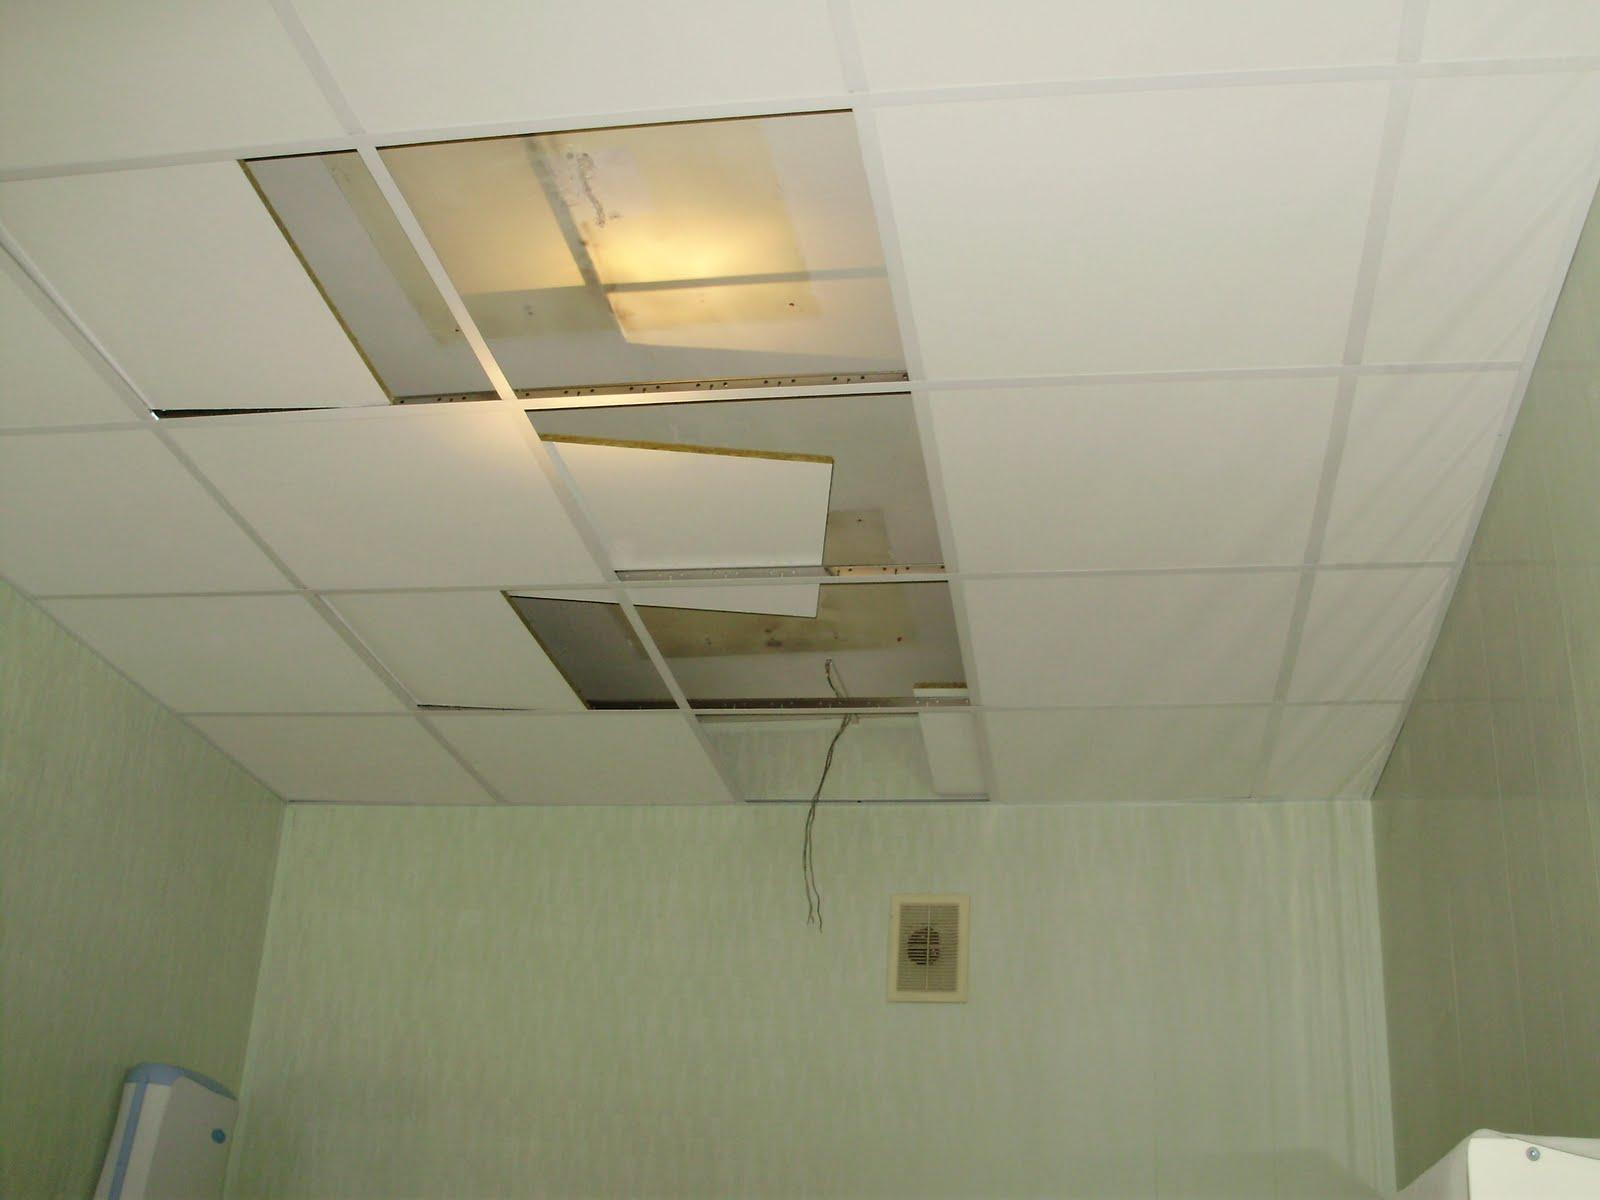 Ремонт потолка армстронг своими руками 100